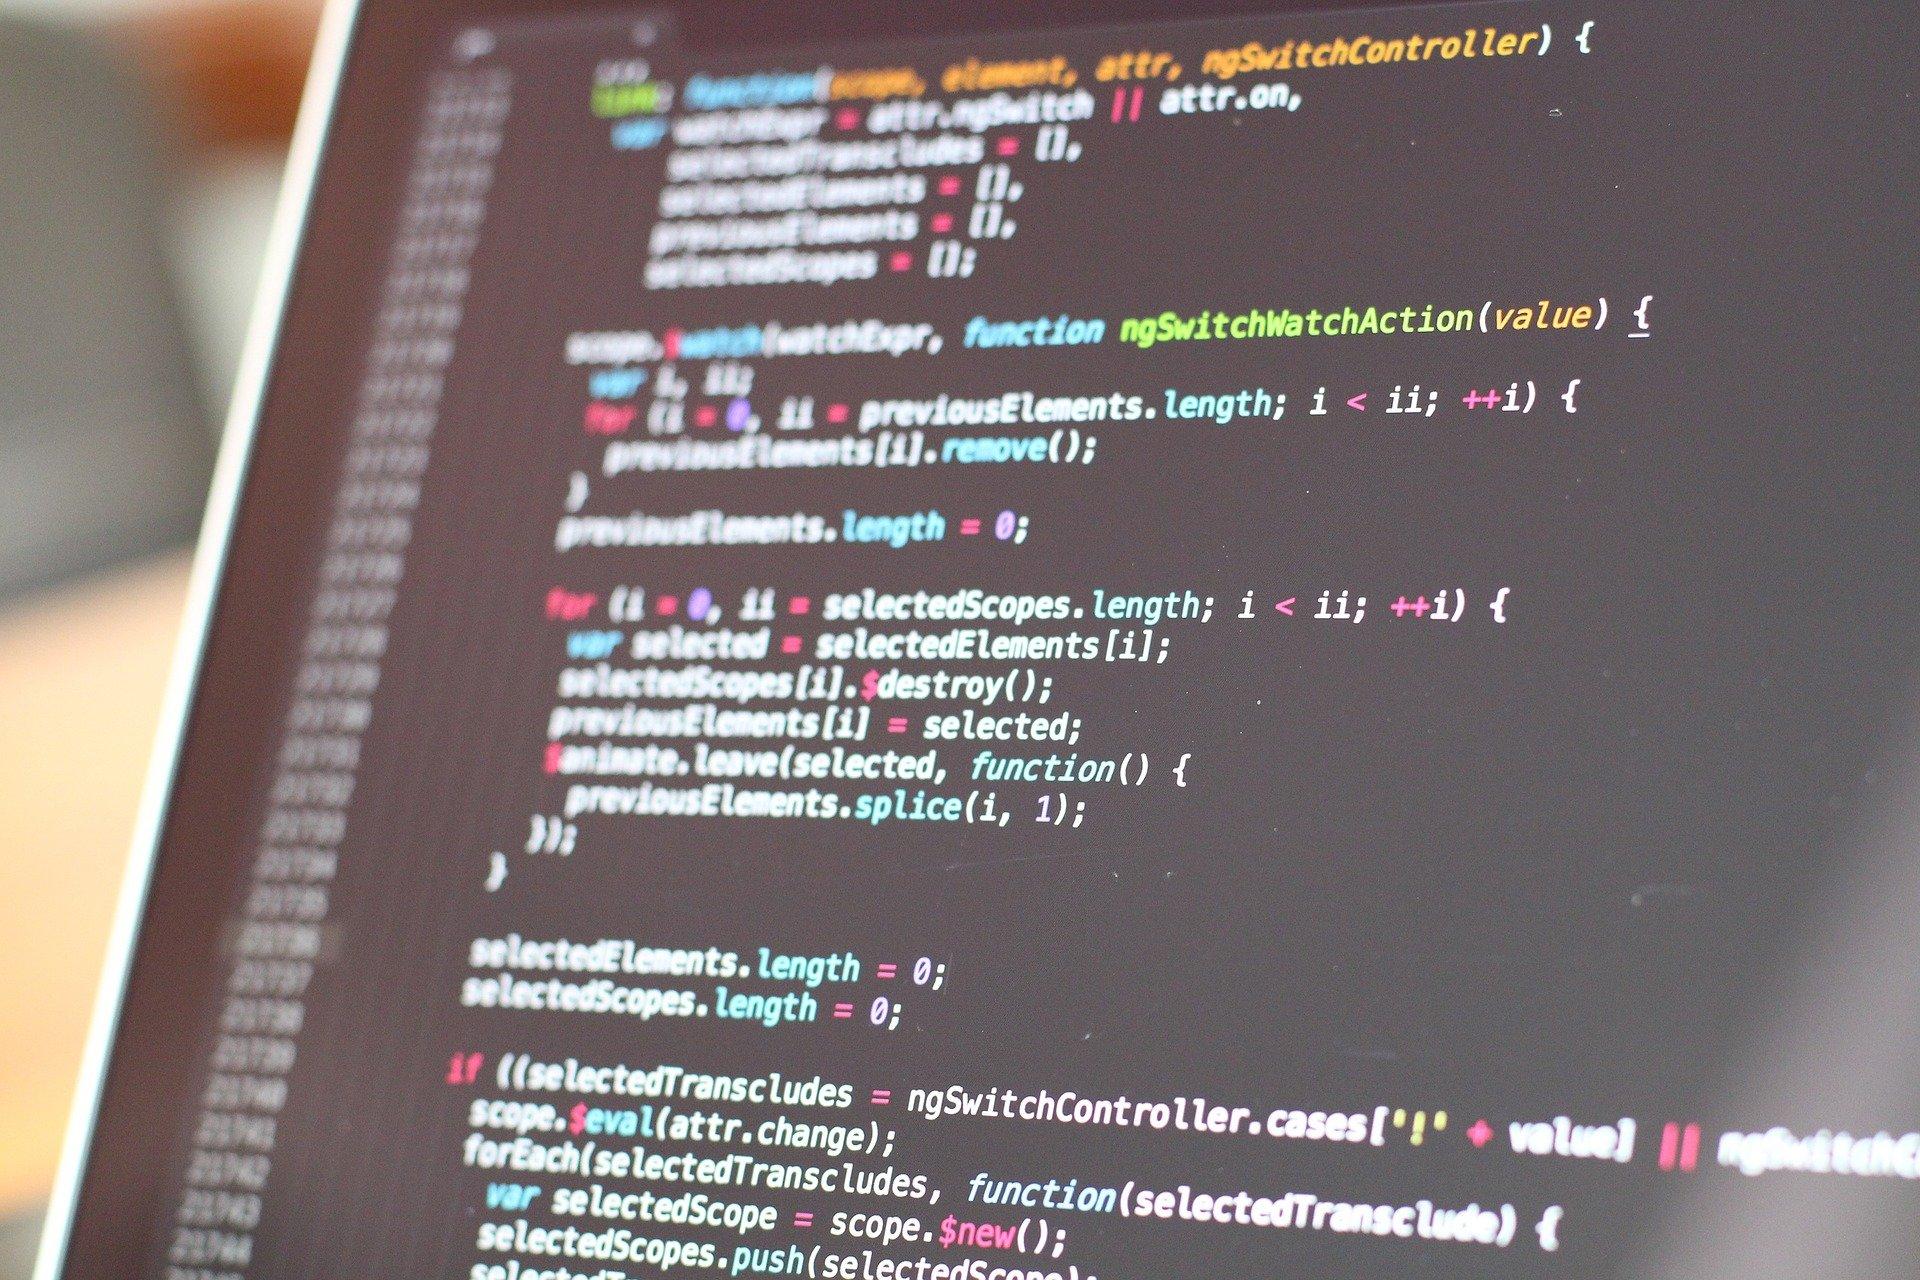 Code on monitor